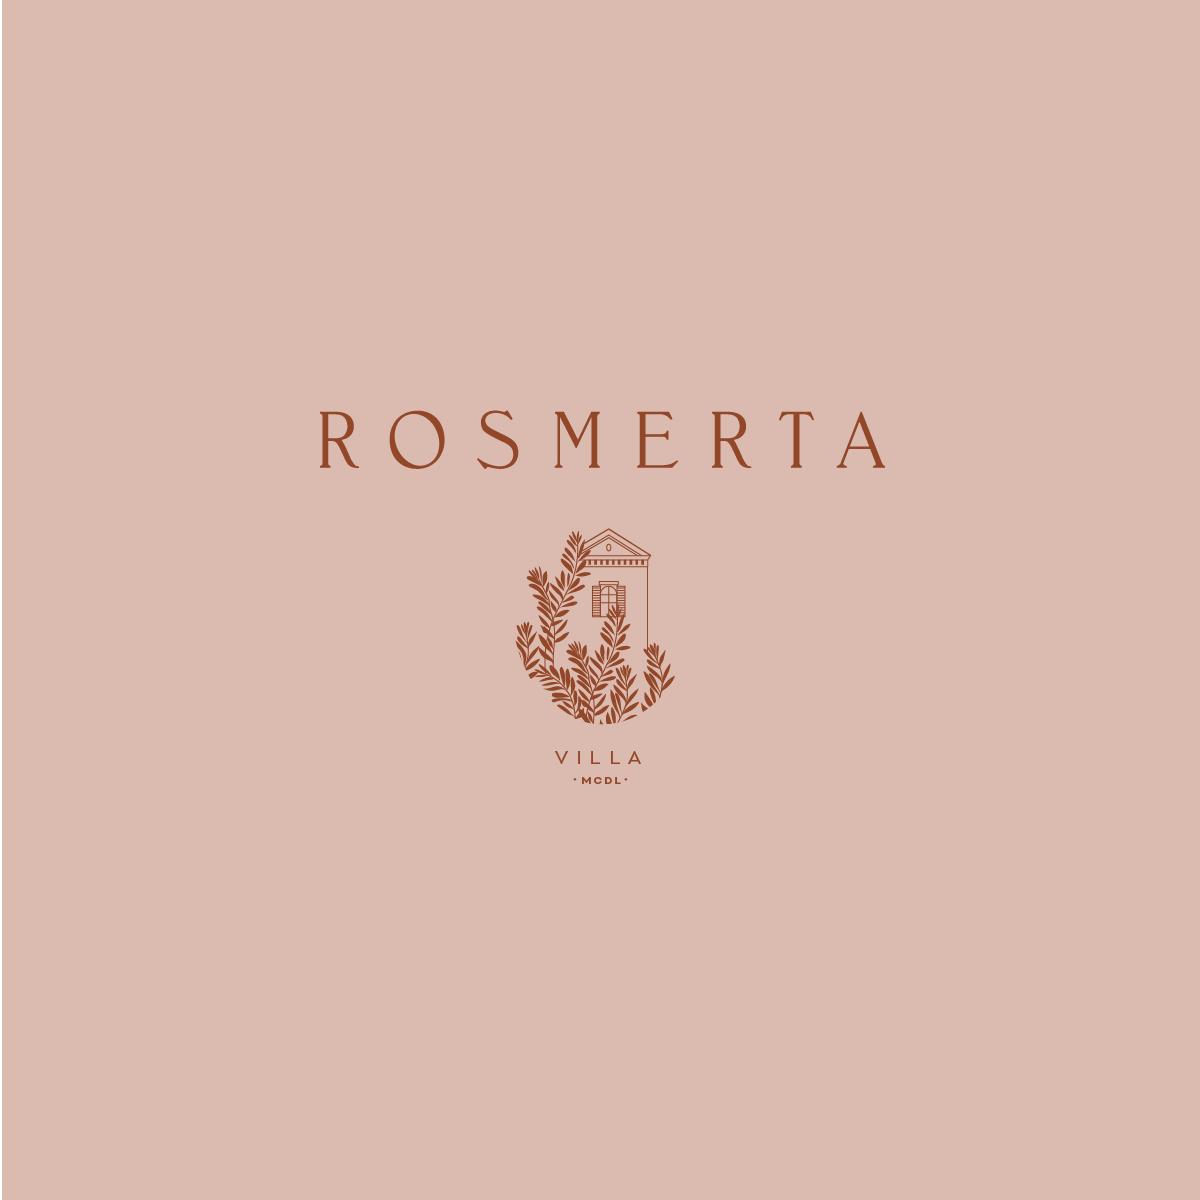 Villa-logo-design-loolaa-designs.png